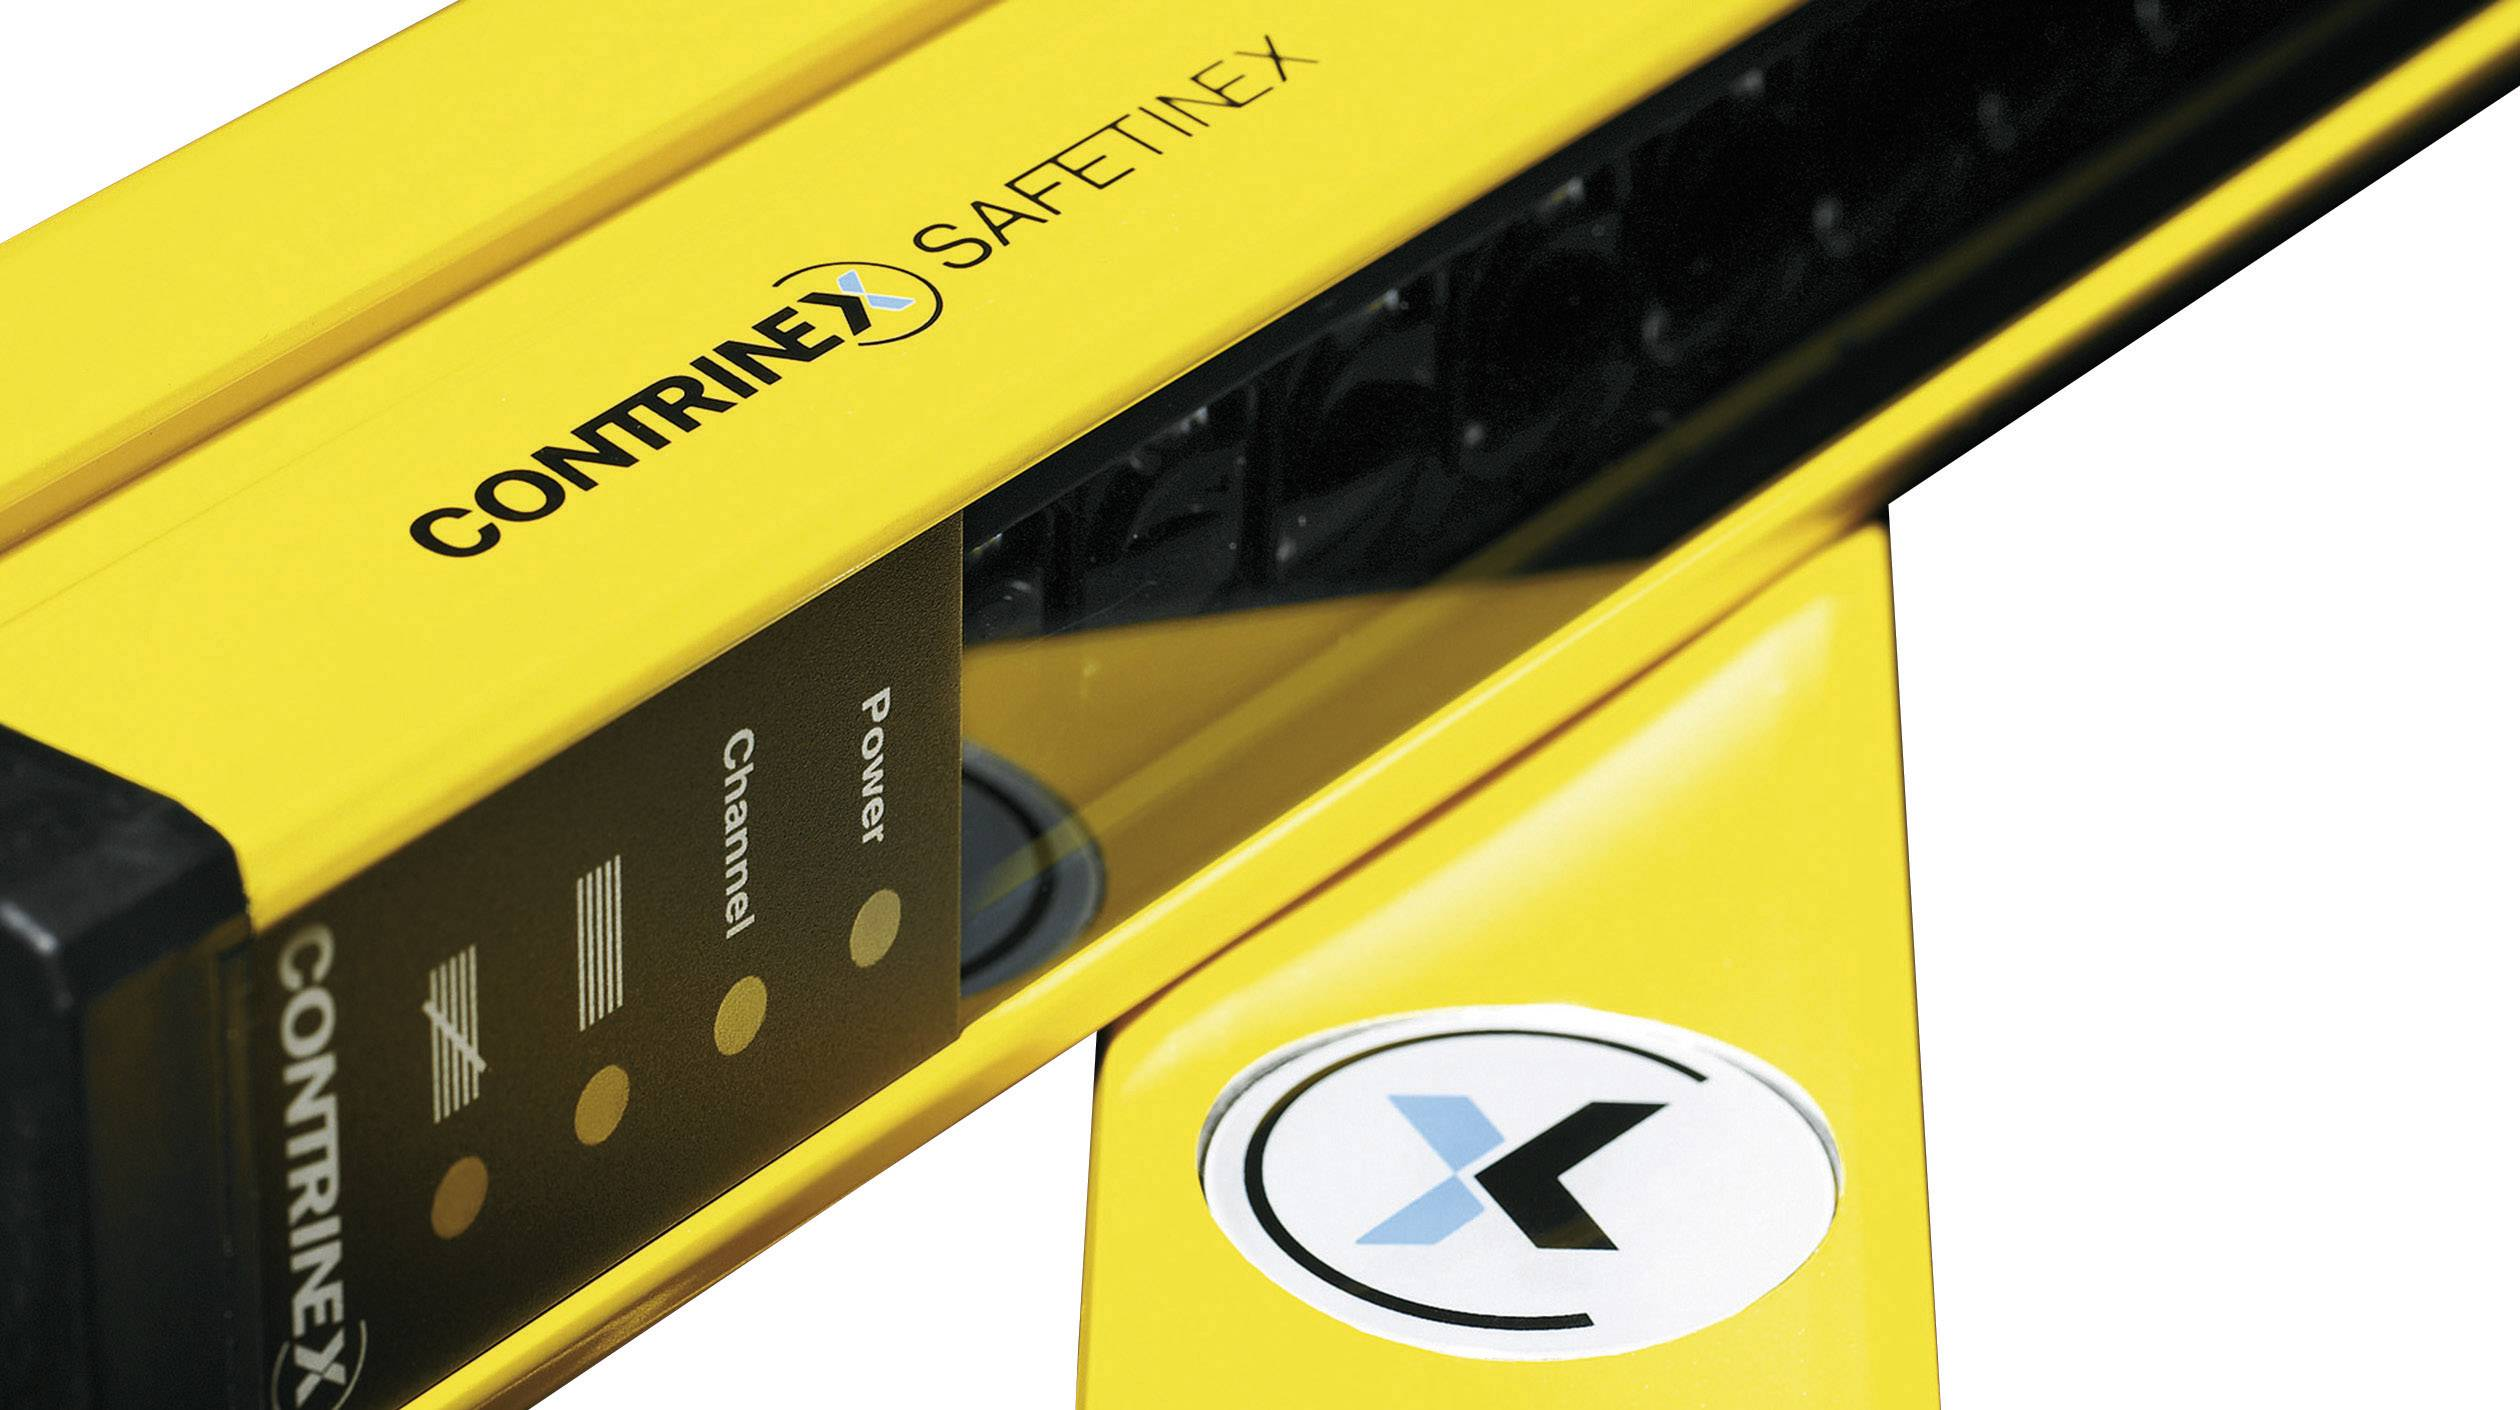 Contrinex YBB-30R4-1800-G012 630 000 736